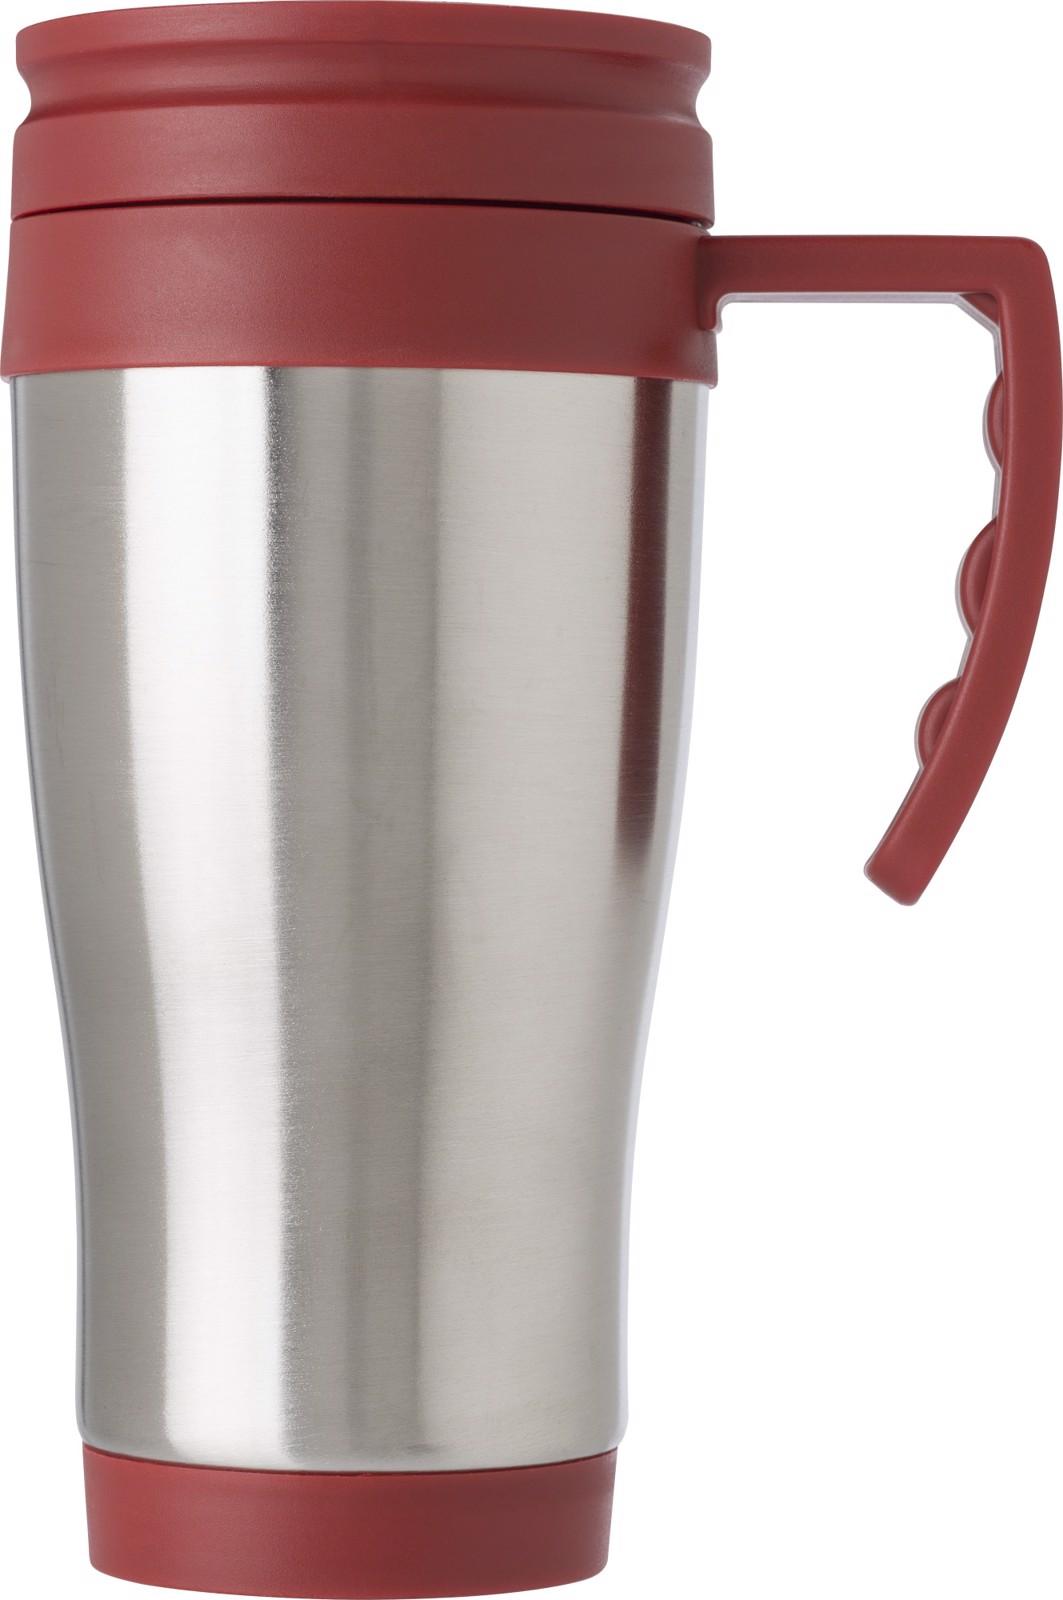 Stainless steel travel mug - Red